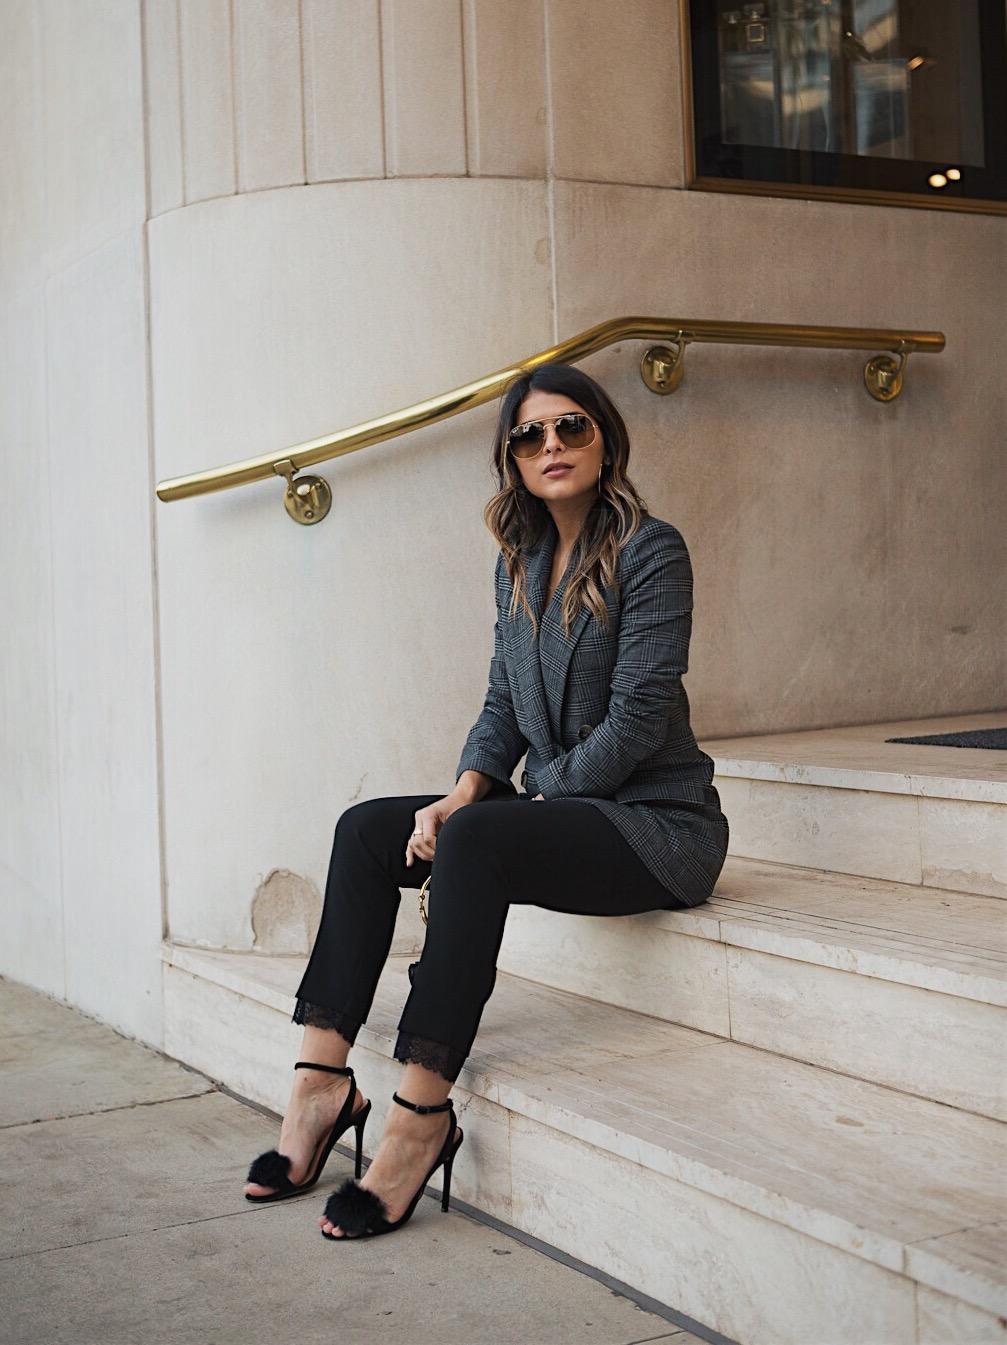 Pam Hetlinger wearing a zara blazer and black pants